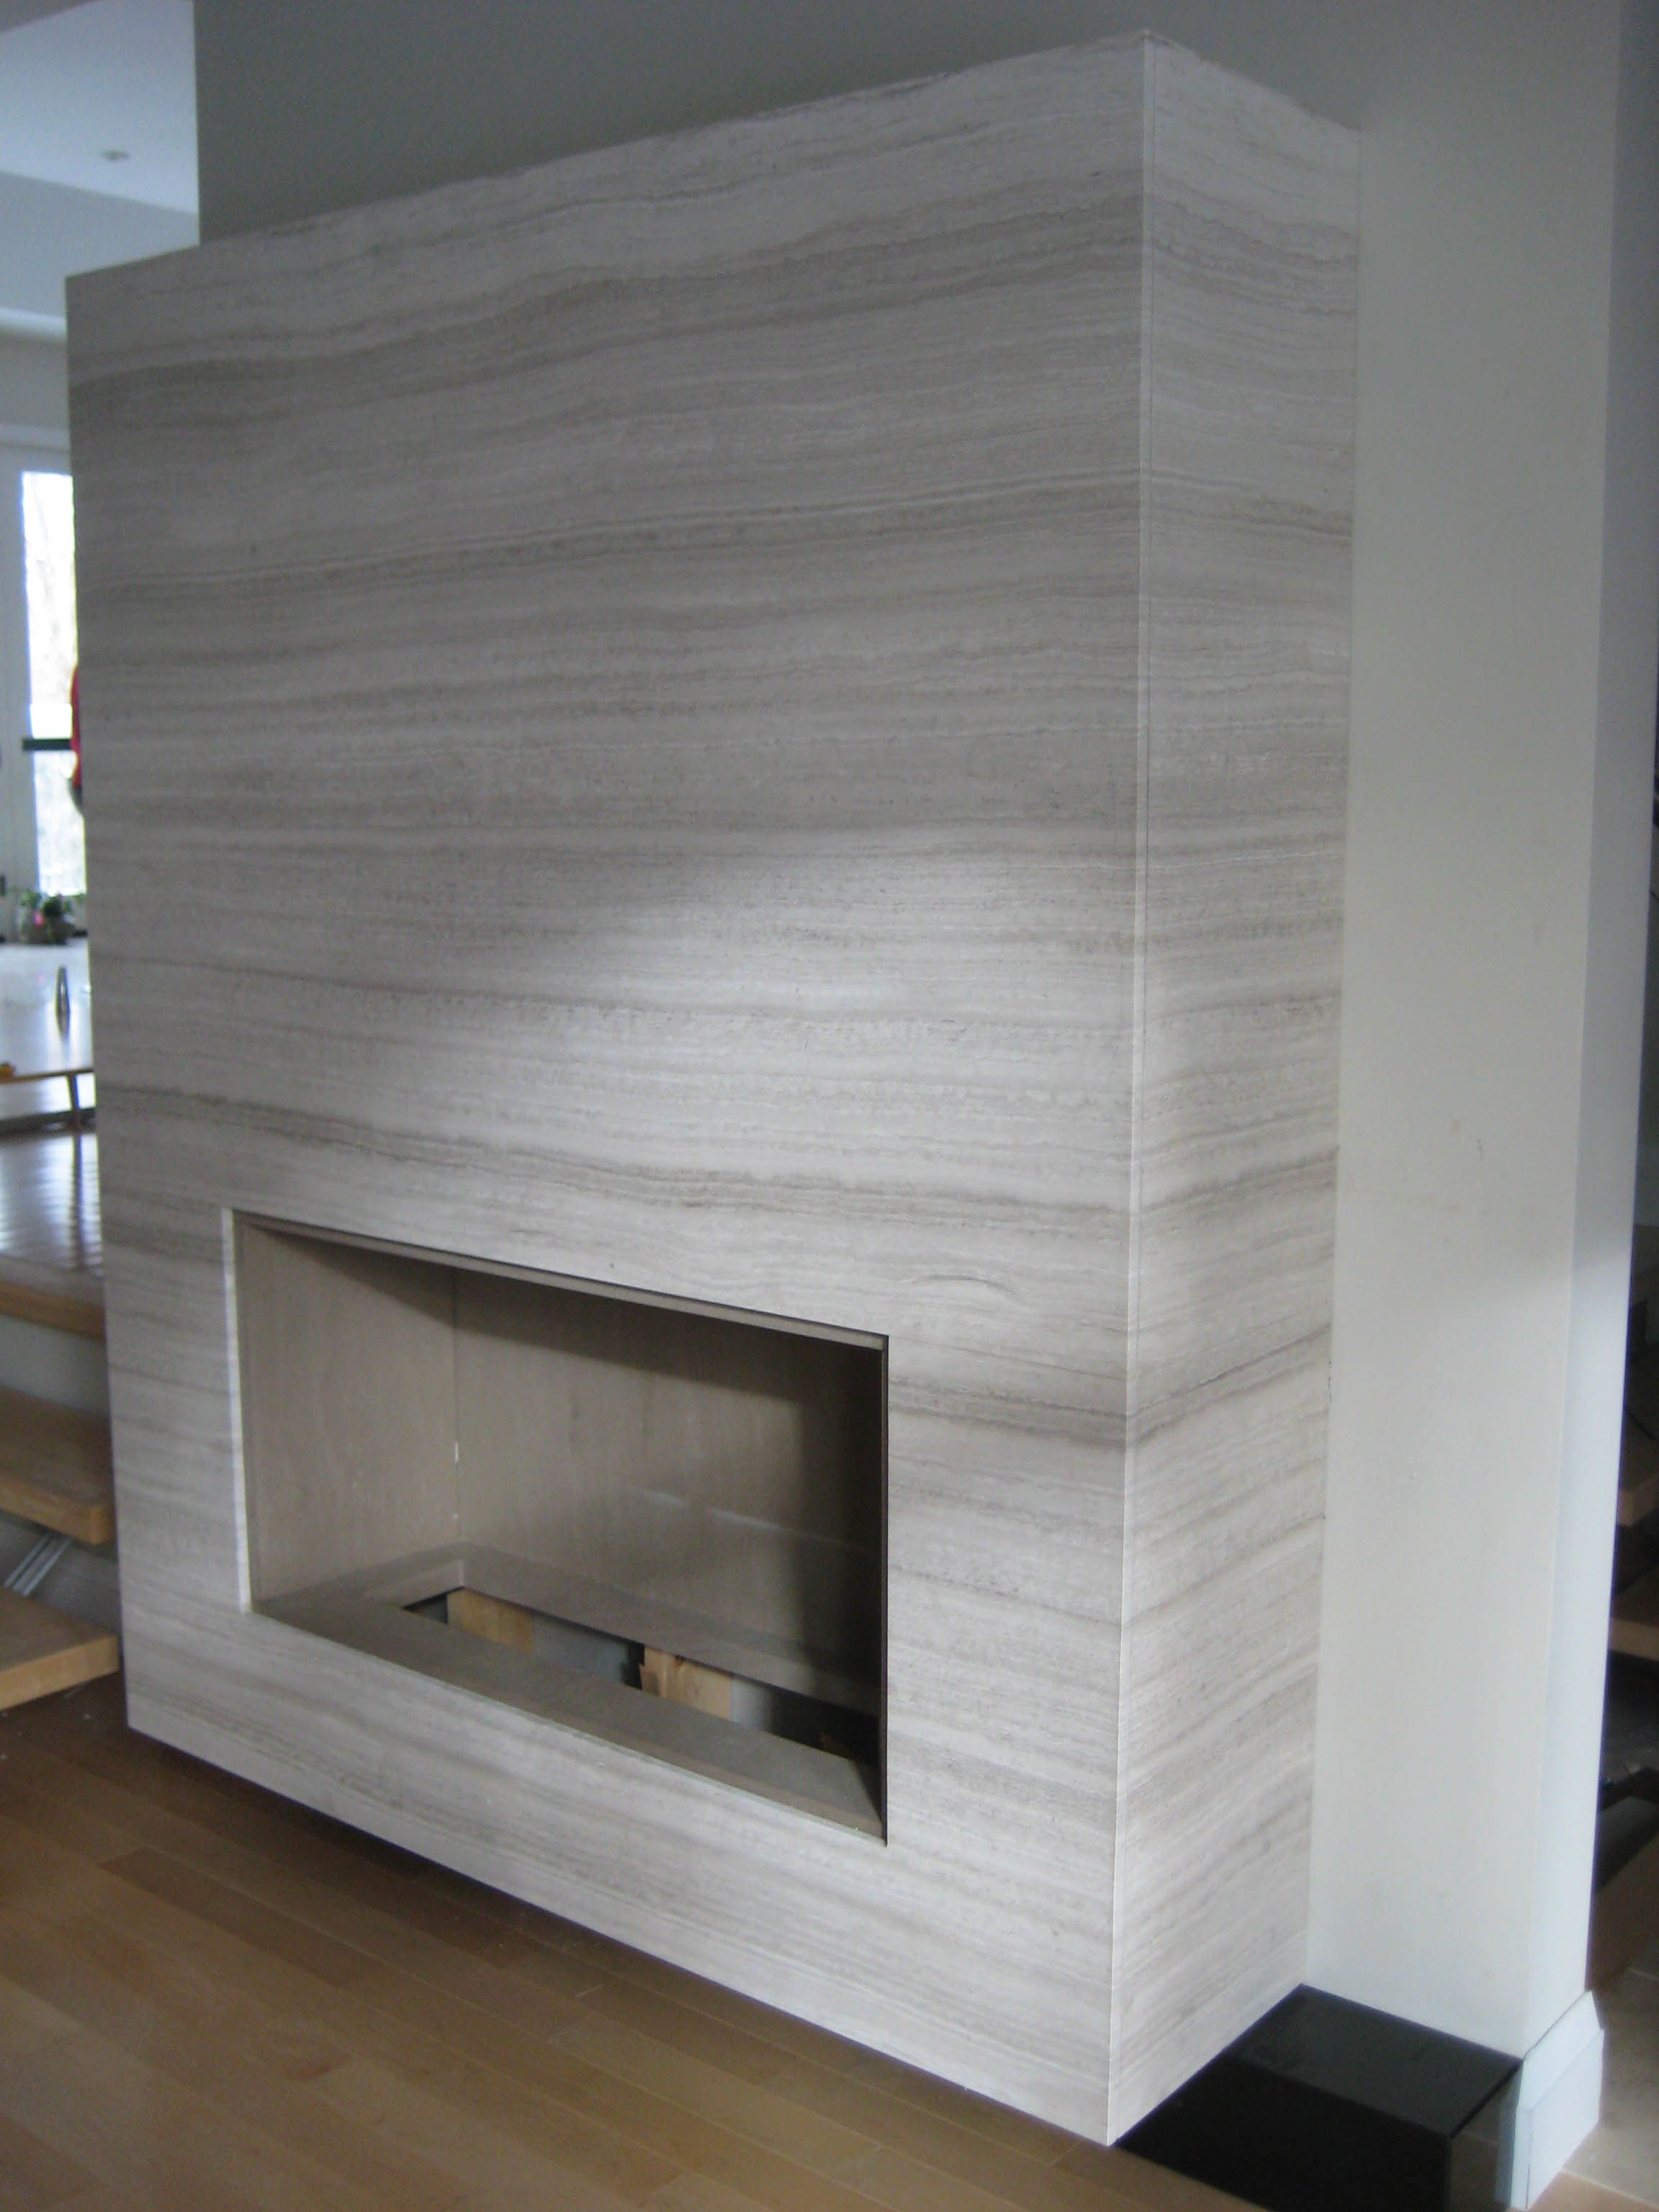 Fireplace Surround Made With Bianco Milano Marble Biancomilano